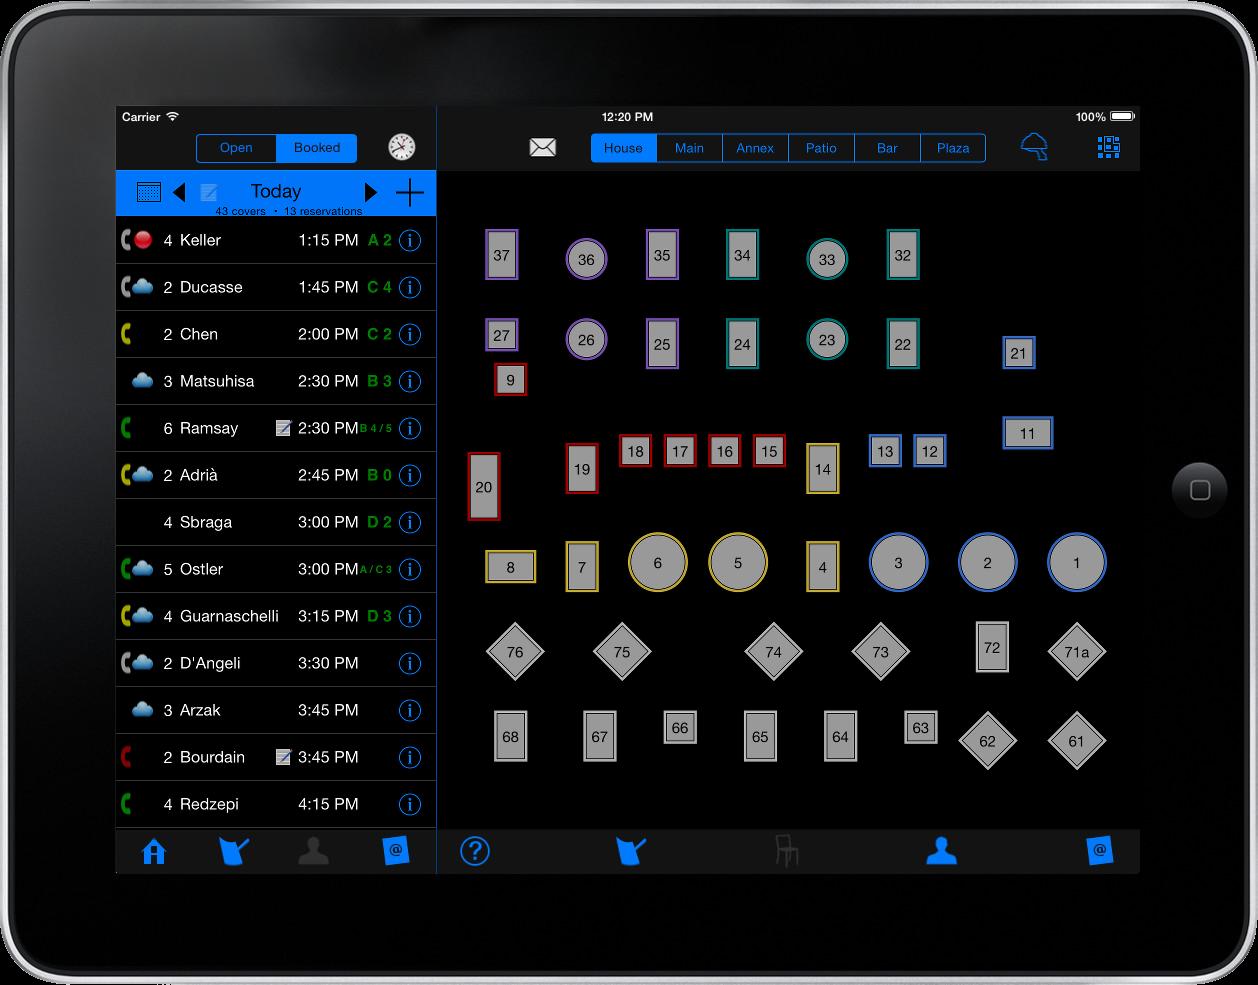 Maitre'D on iPad - Table management